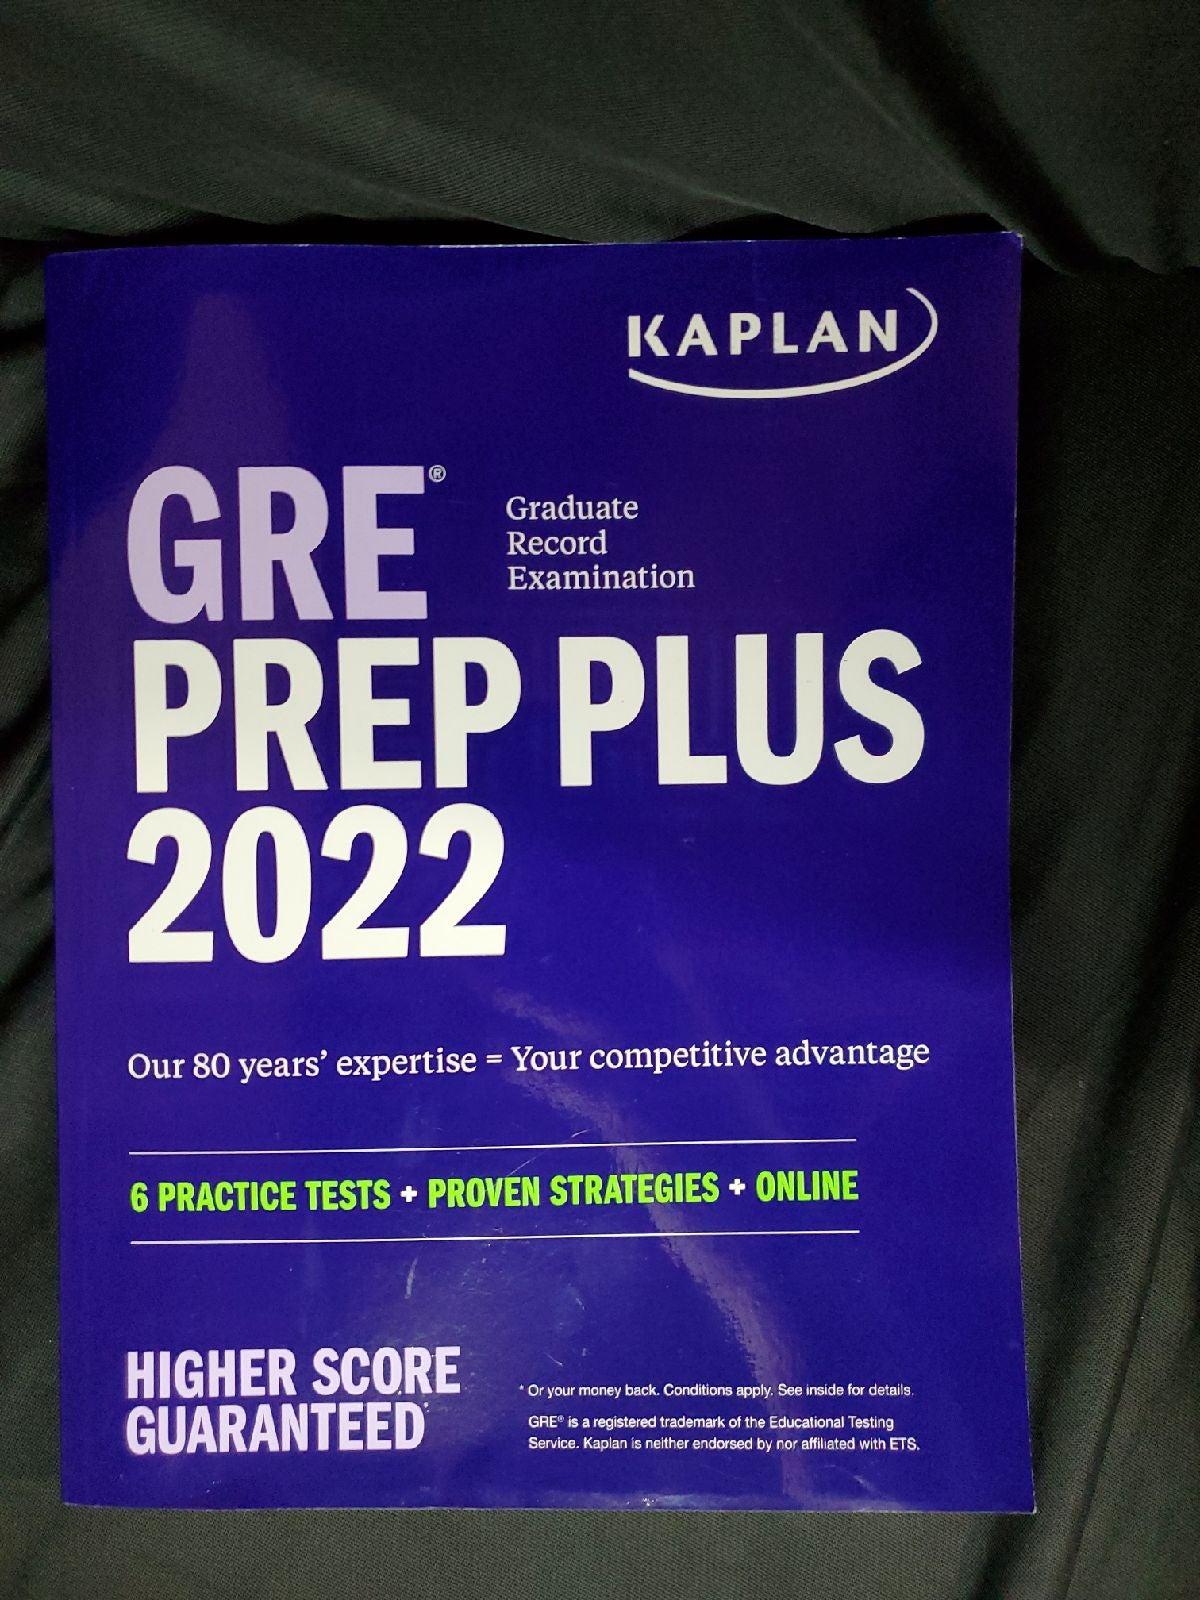 Kaplan GRE Prep Plus 2022 Higher Score